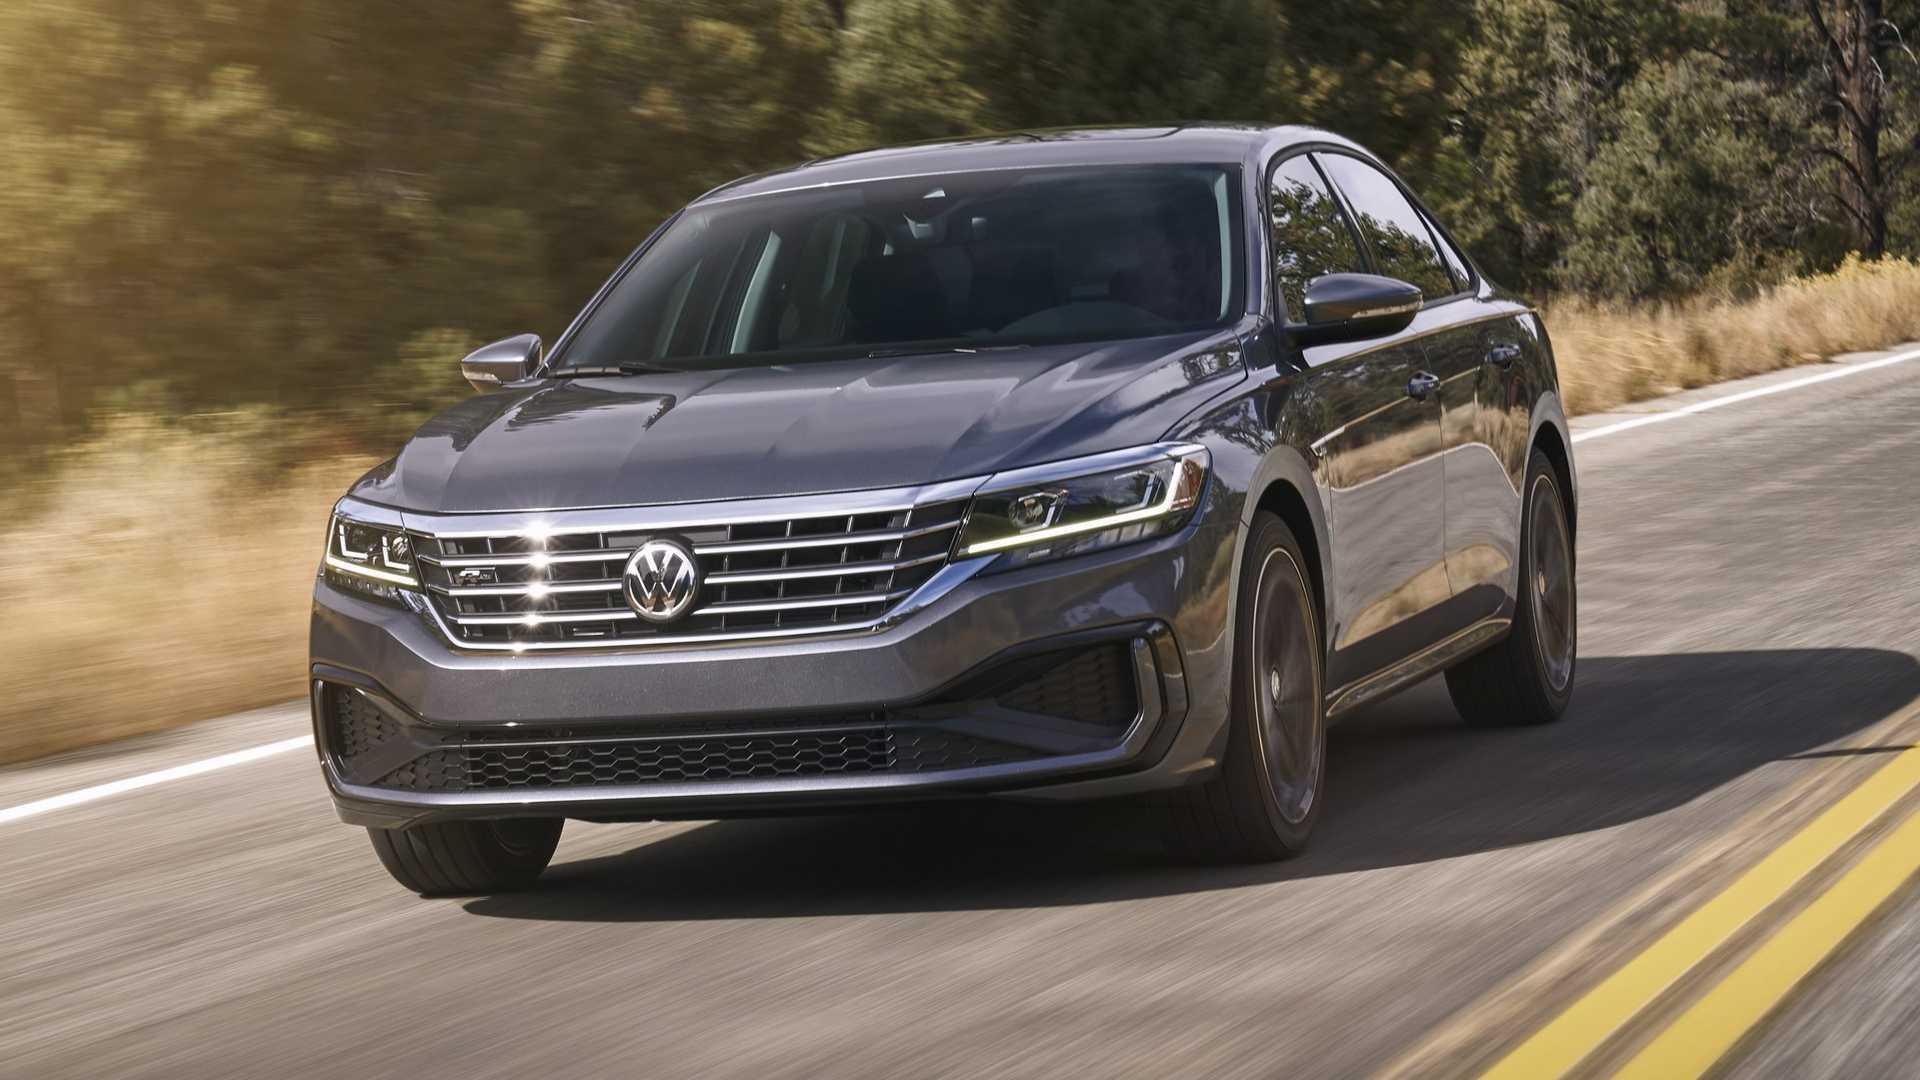 2020 Volkswagen Passat Ozellikleri Ve Fiyati Shiftdelete Net